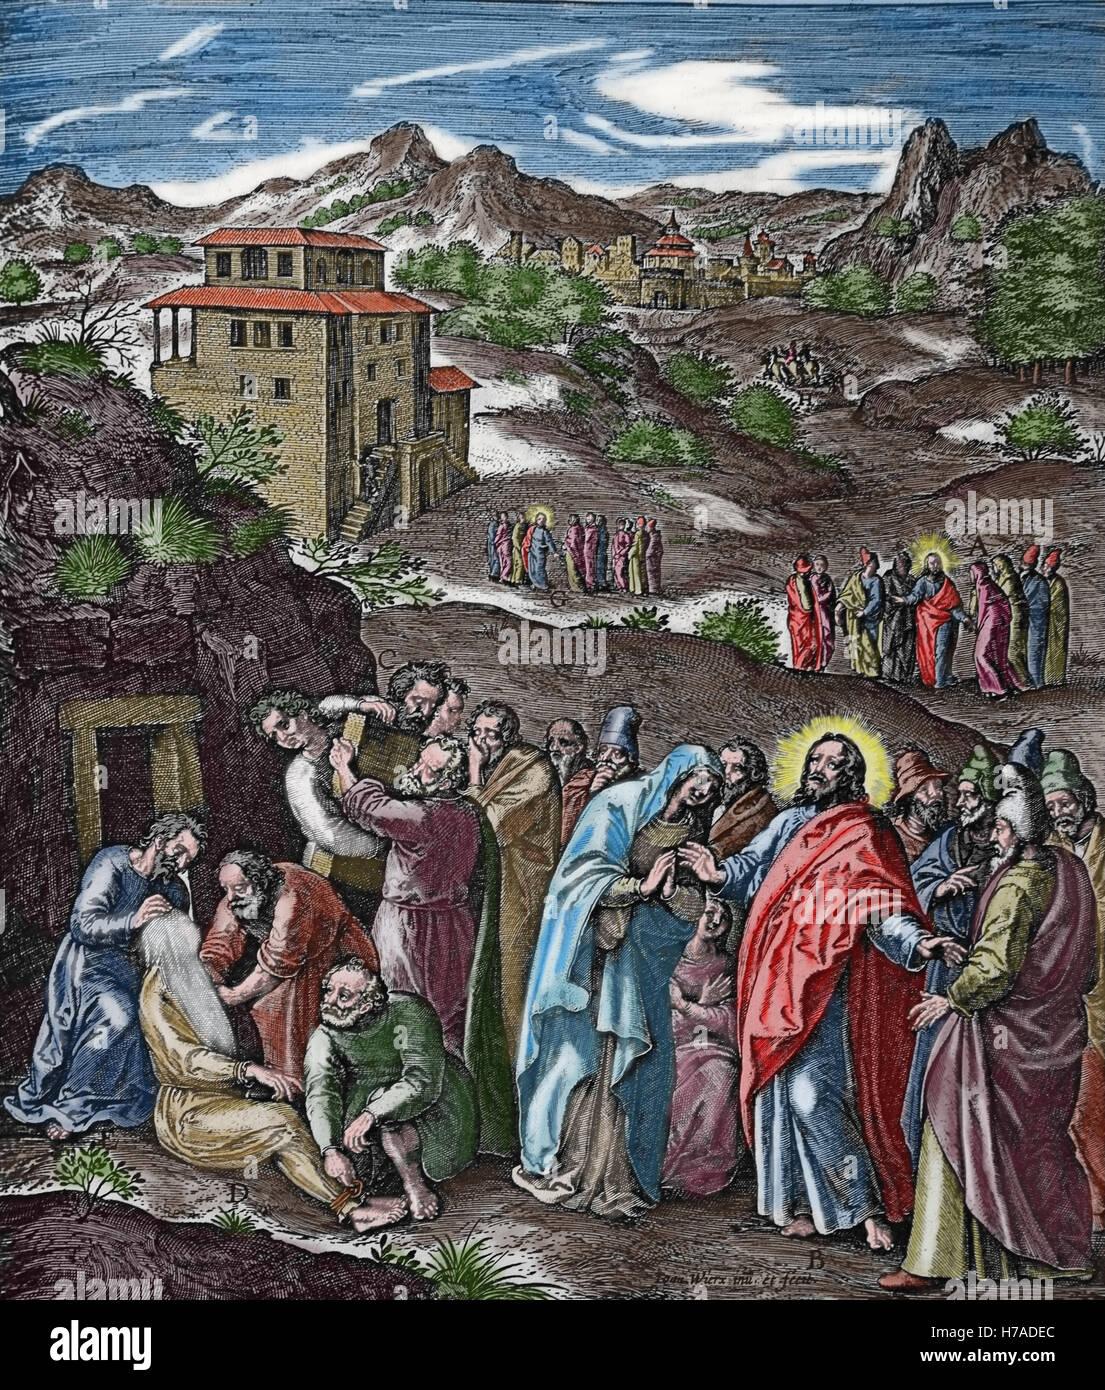 Jesus Of Nazareth Color Stockfotos & Jesus Of Nazareth Color Bilder ...